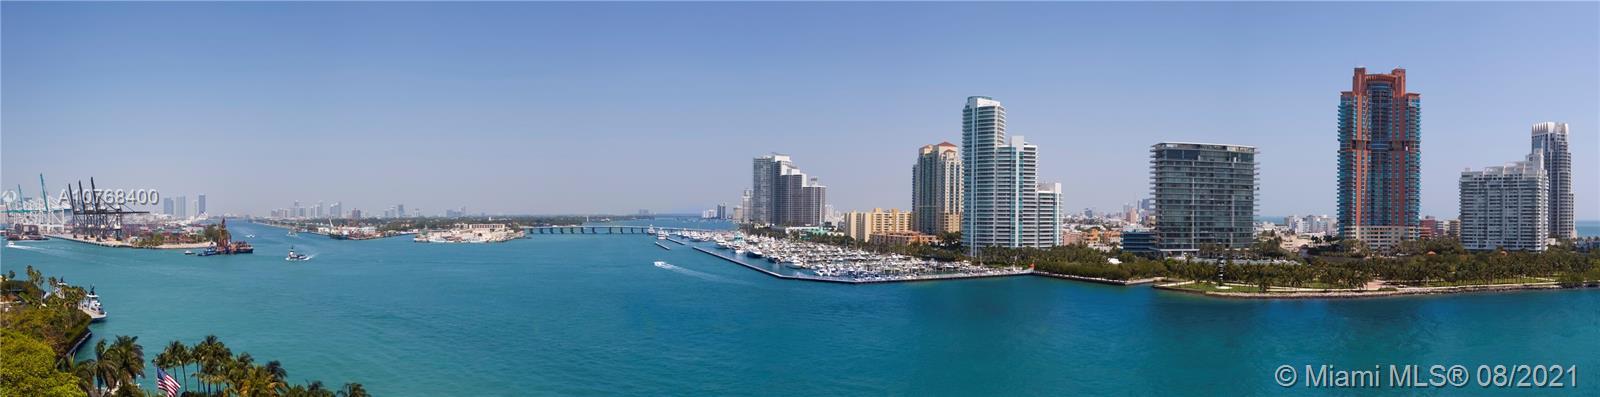 6893 Fisher Island Dr 6893, Miami Beach, FL 33109